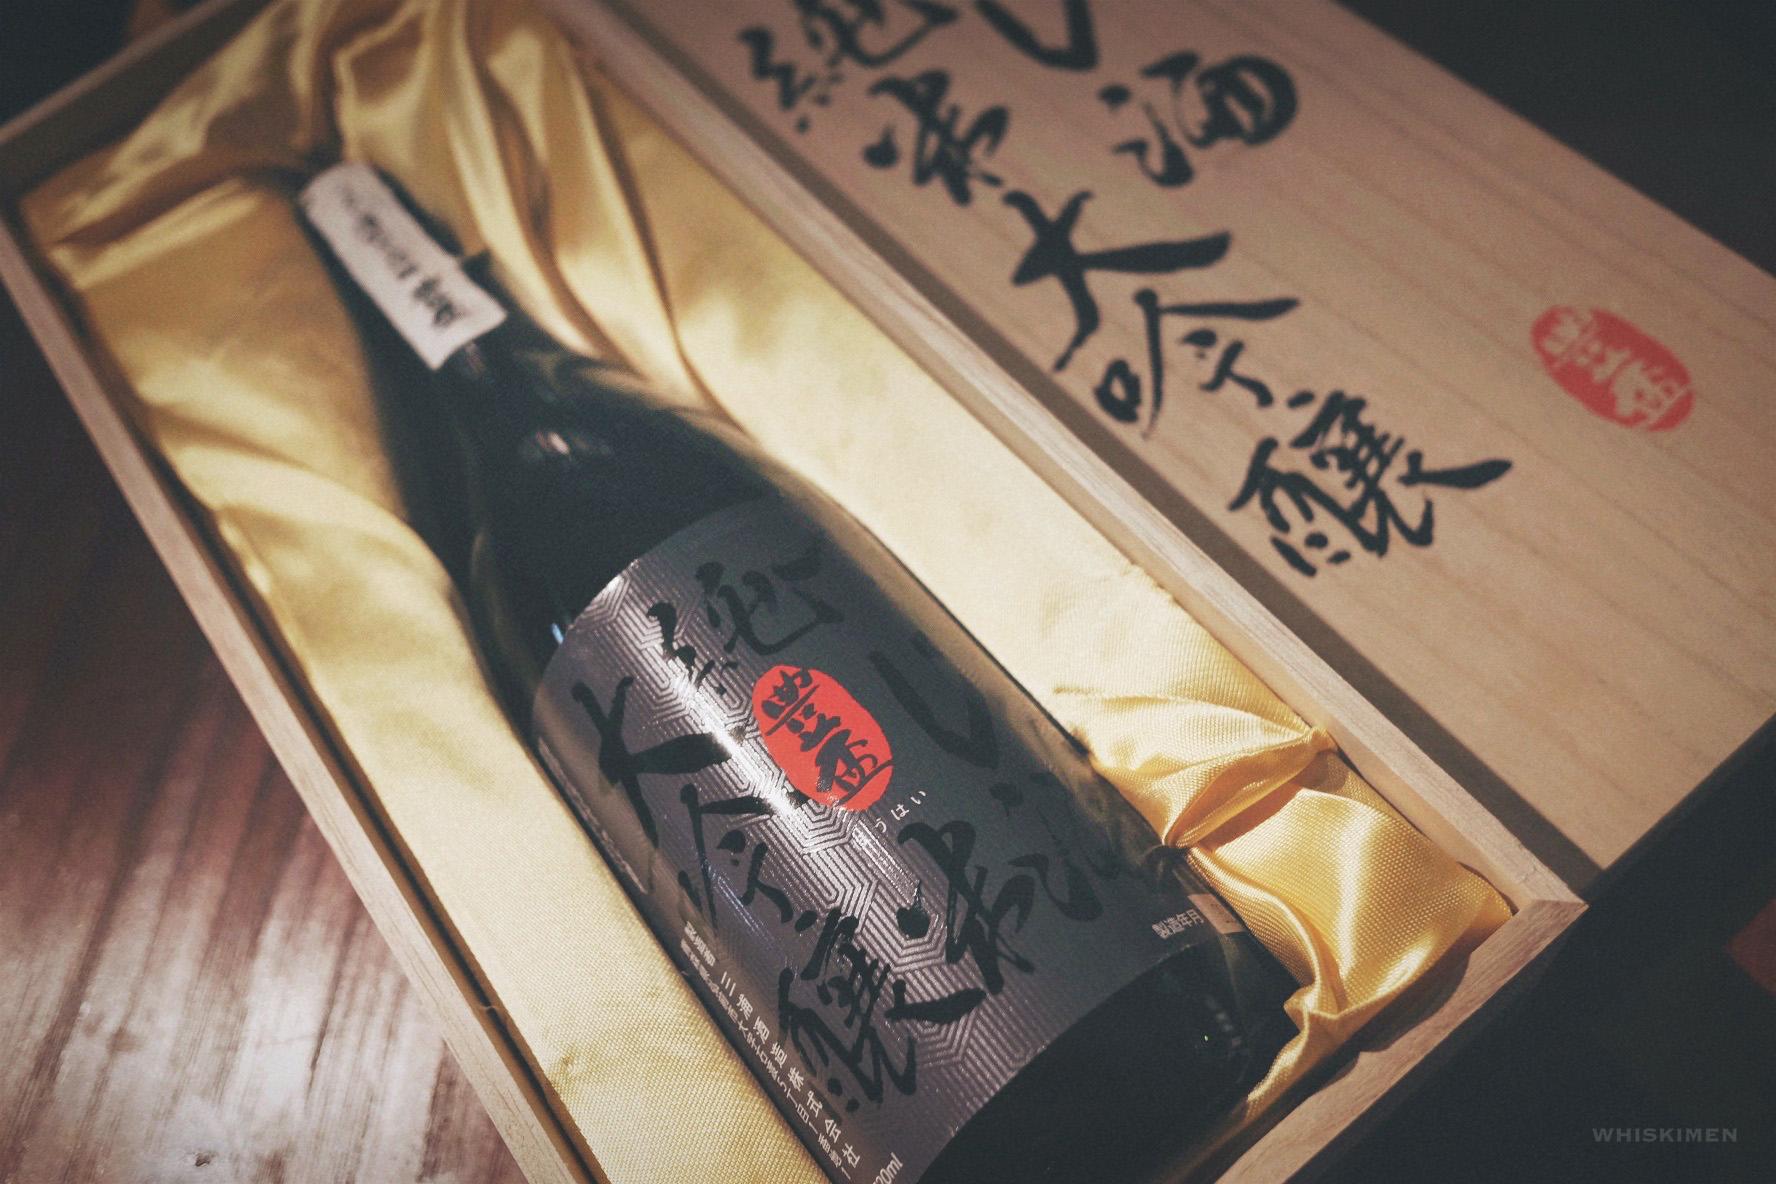 豐盃 つるし酒 純米大吟釀 山田錦 青森県 雫取 三浦酒造 日本酒 sake 清酒 日本 japan